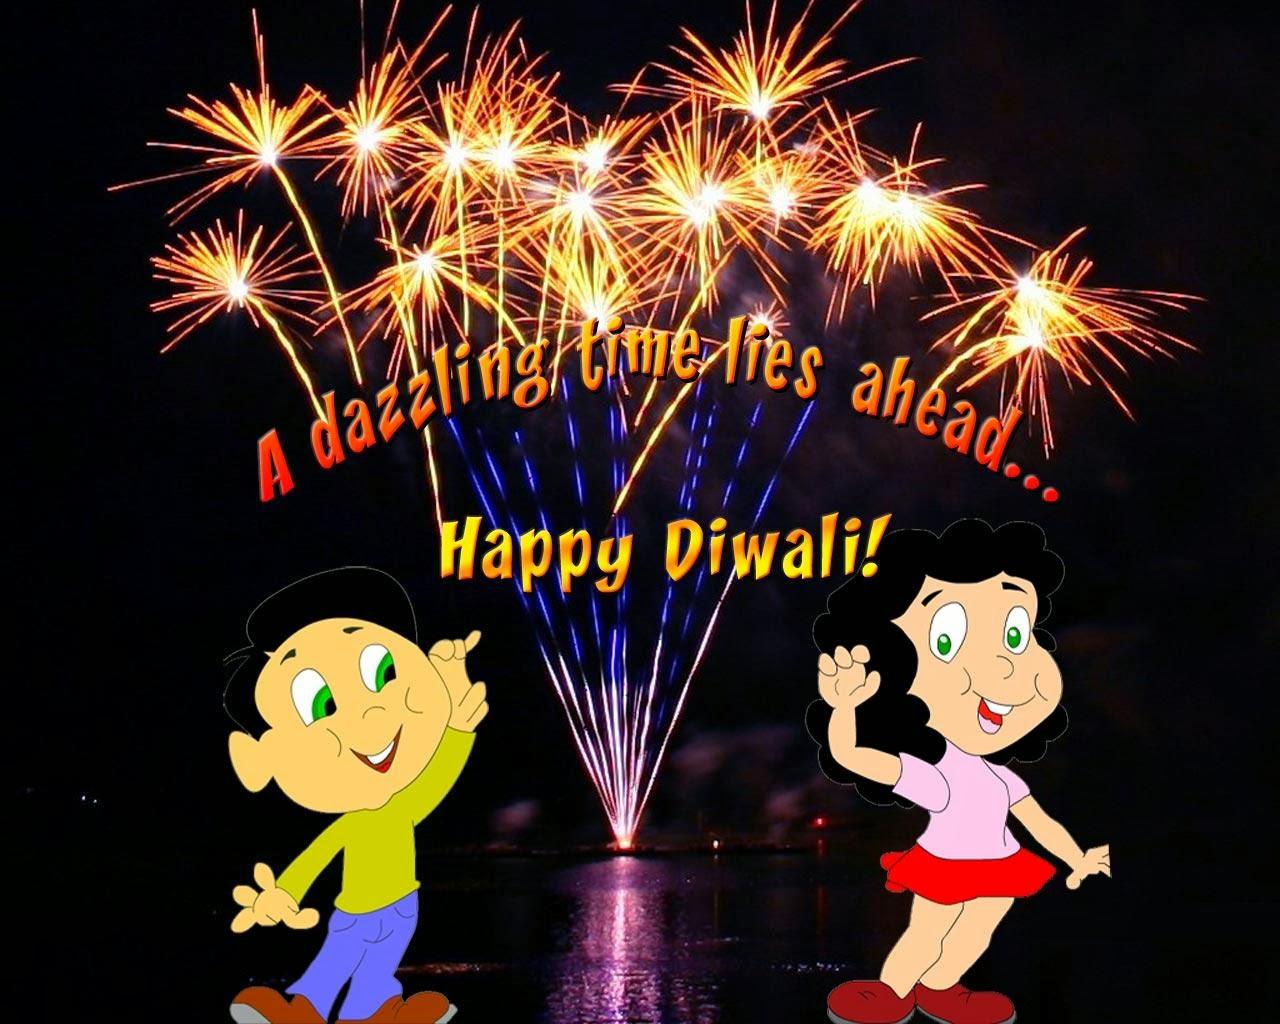 happy diwali fireworks hd - photo #31